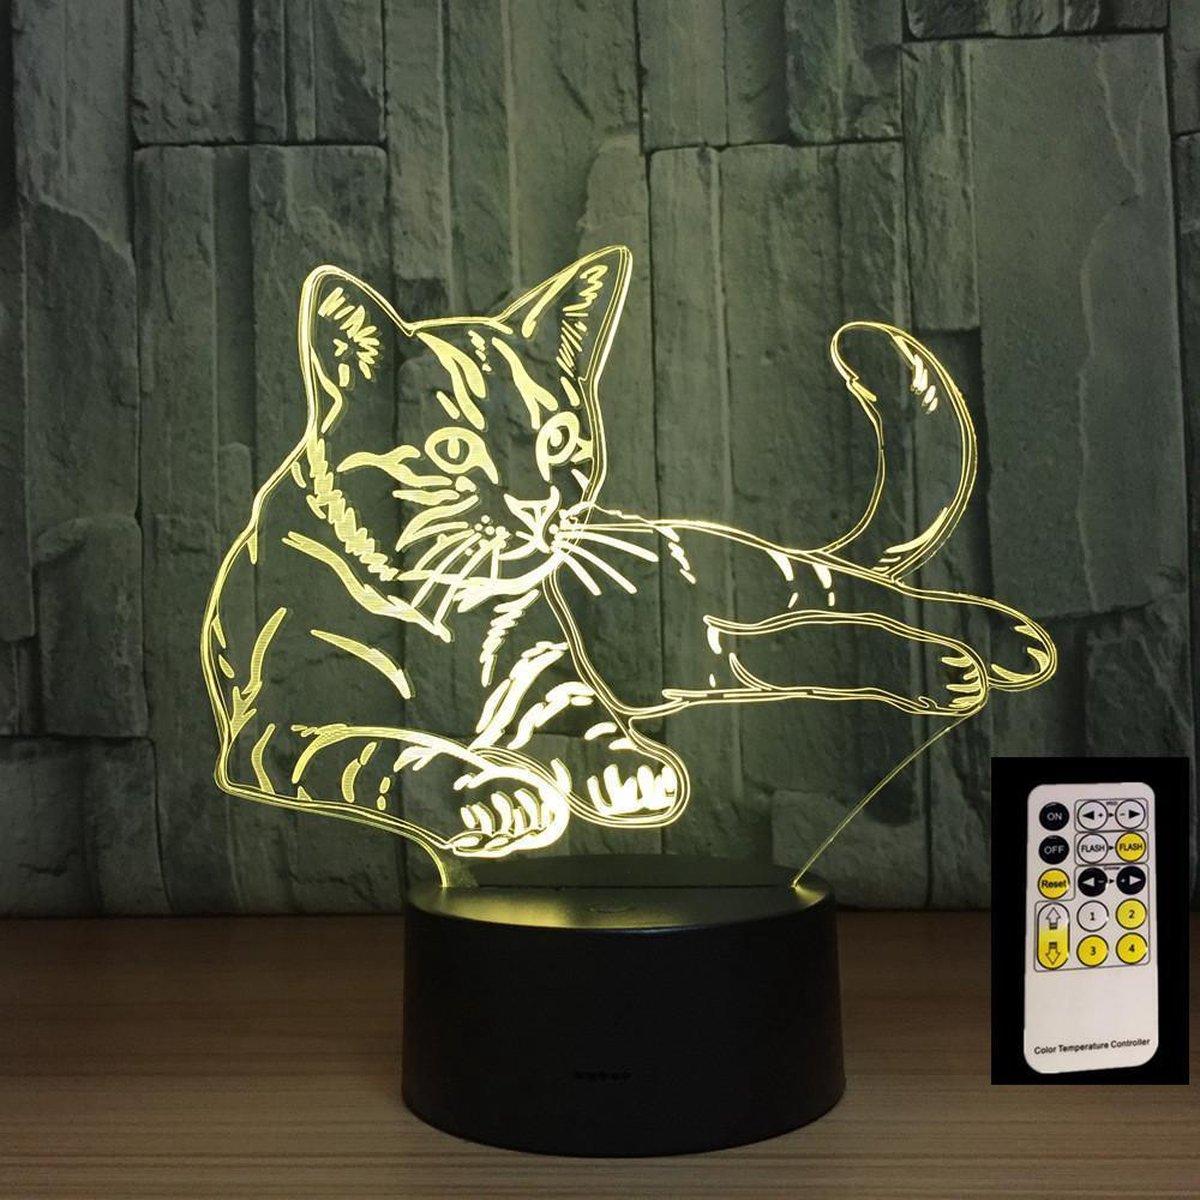 | 3D Led Lamp Heerlijk slapende kat 3D nachtlampje